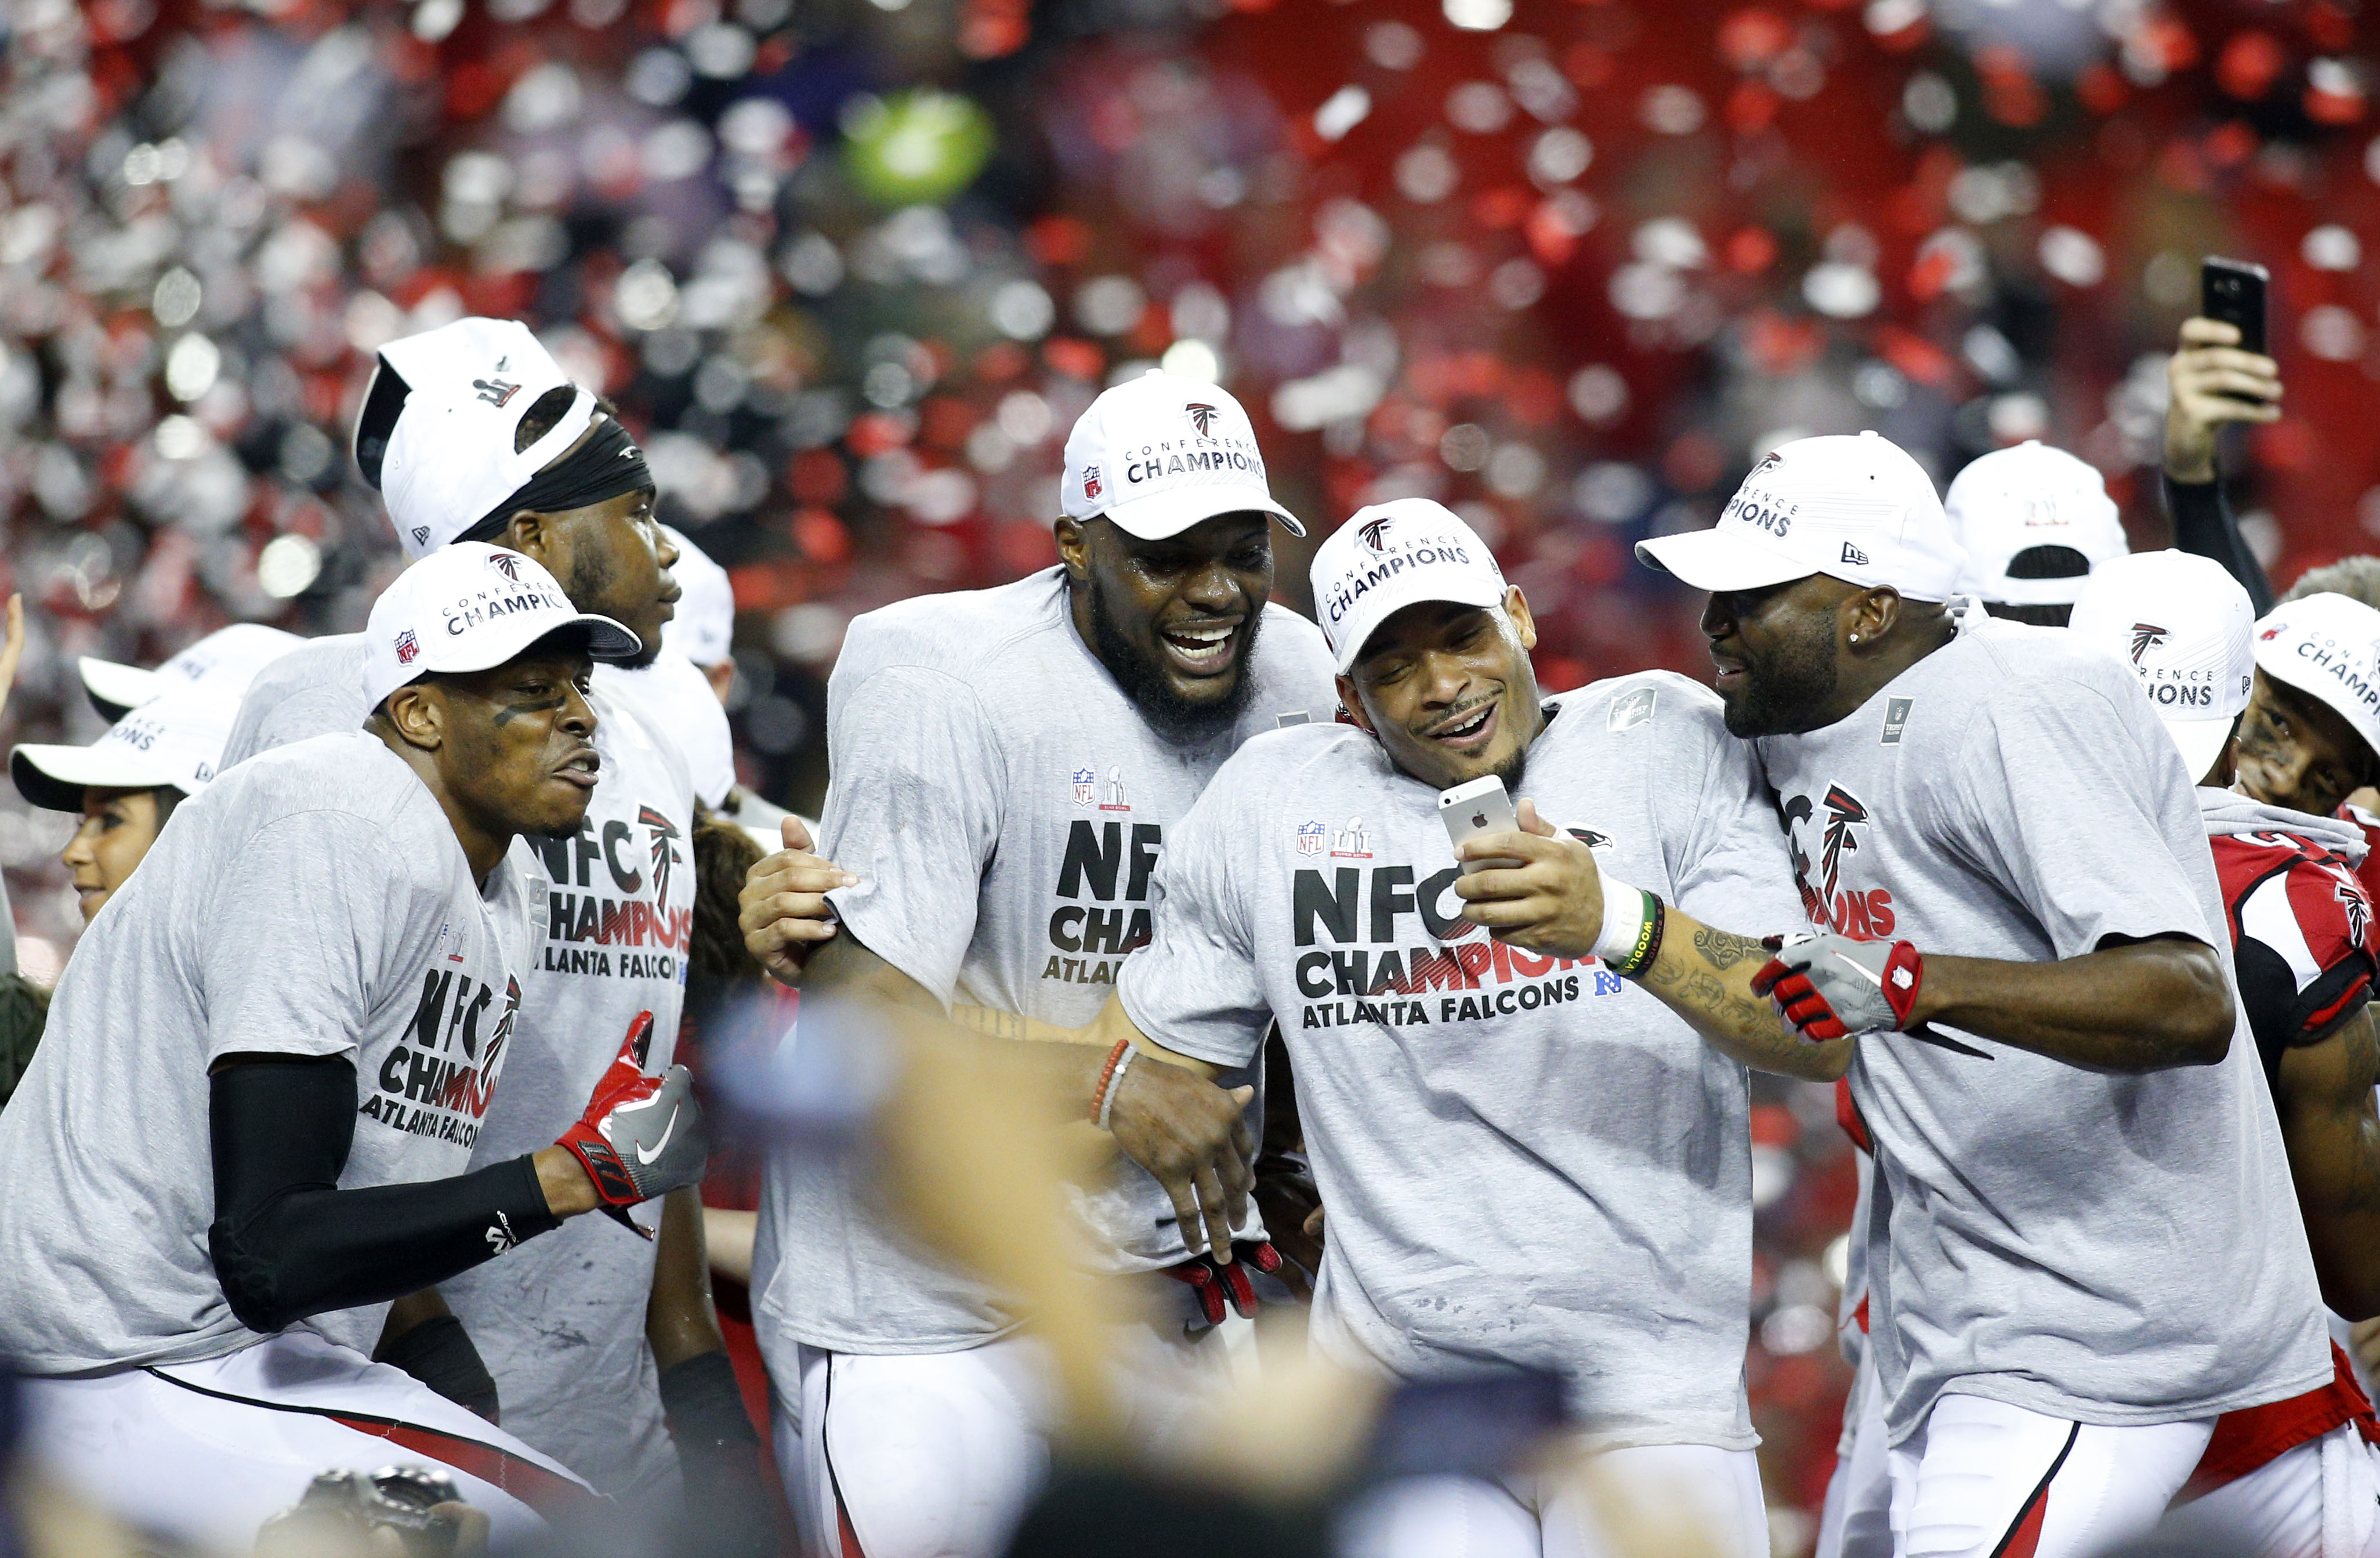 Atlanta Falcons 2017 NFC Championship gear revealed